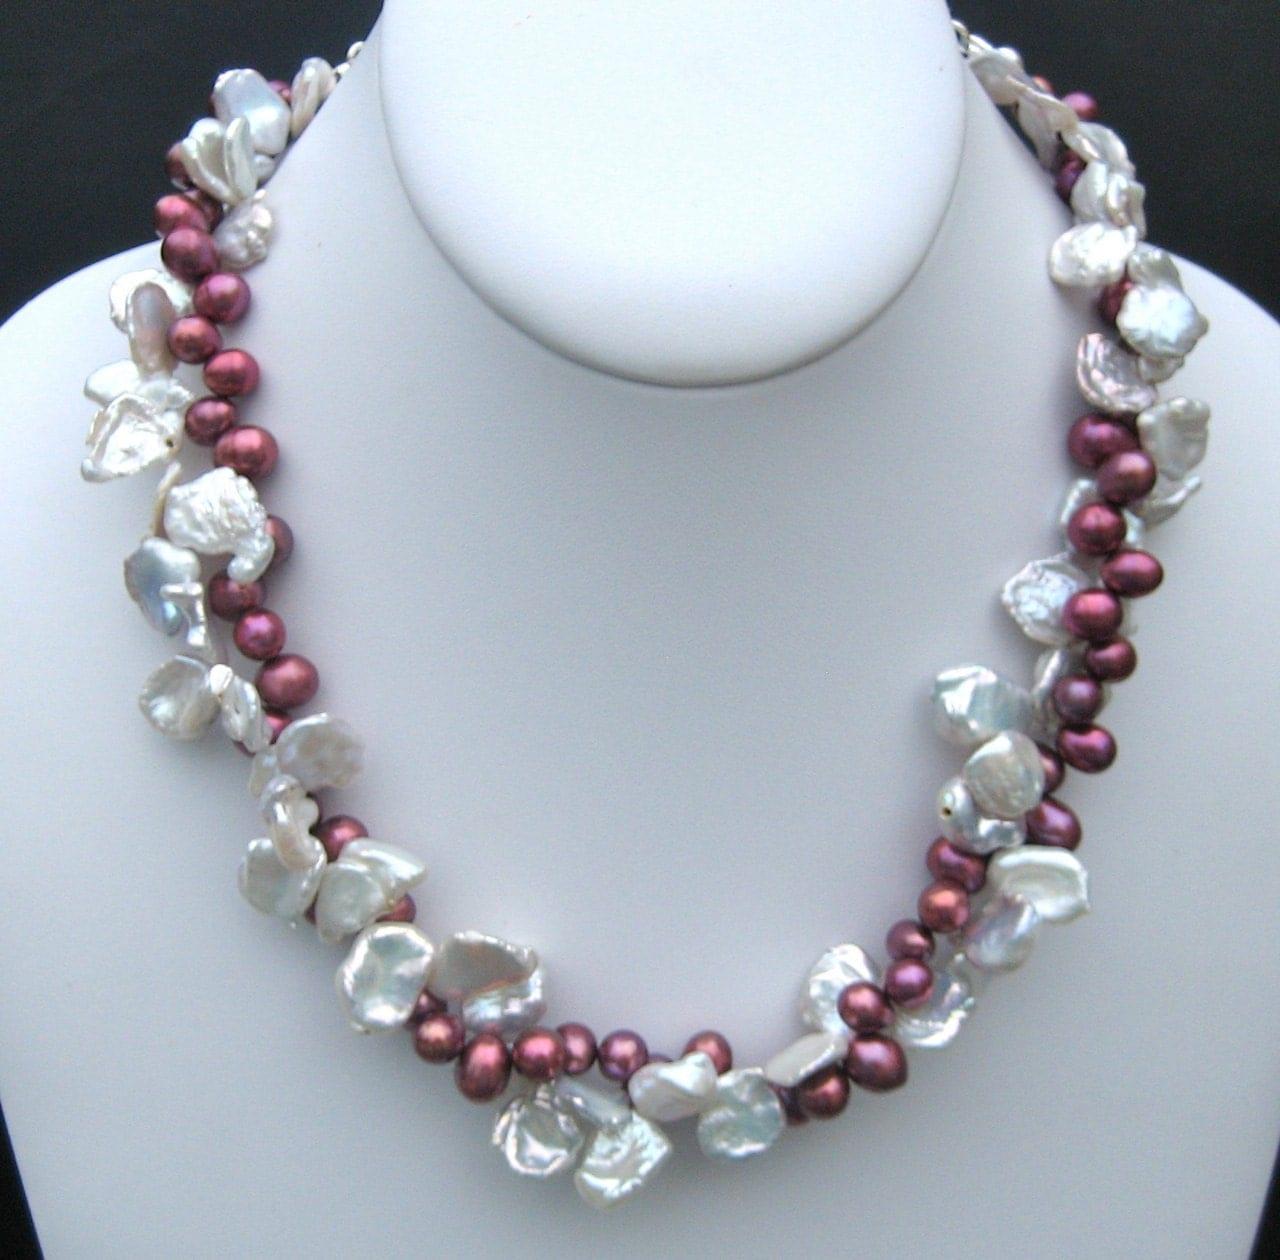 Keshi Pearls White Keshi And Raspberry Pearls Necklace Huge